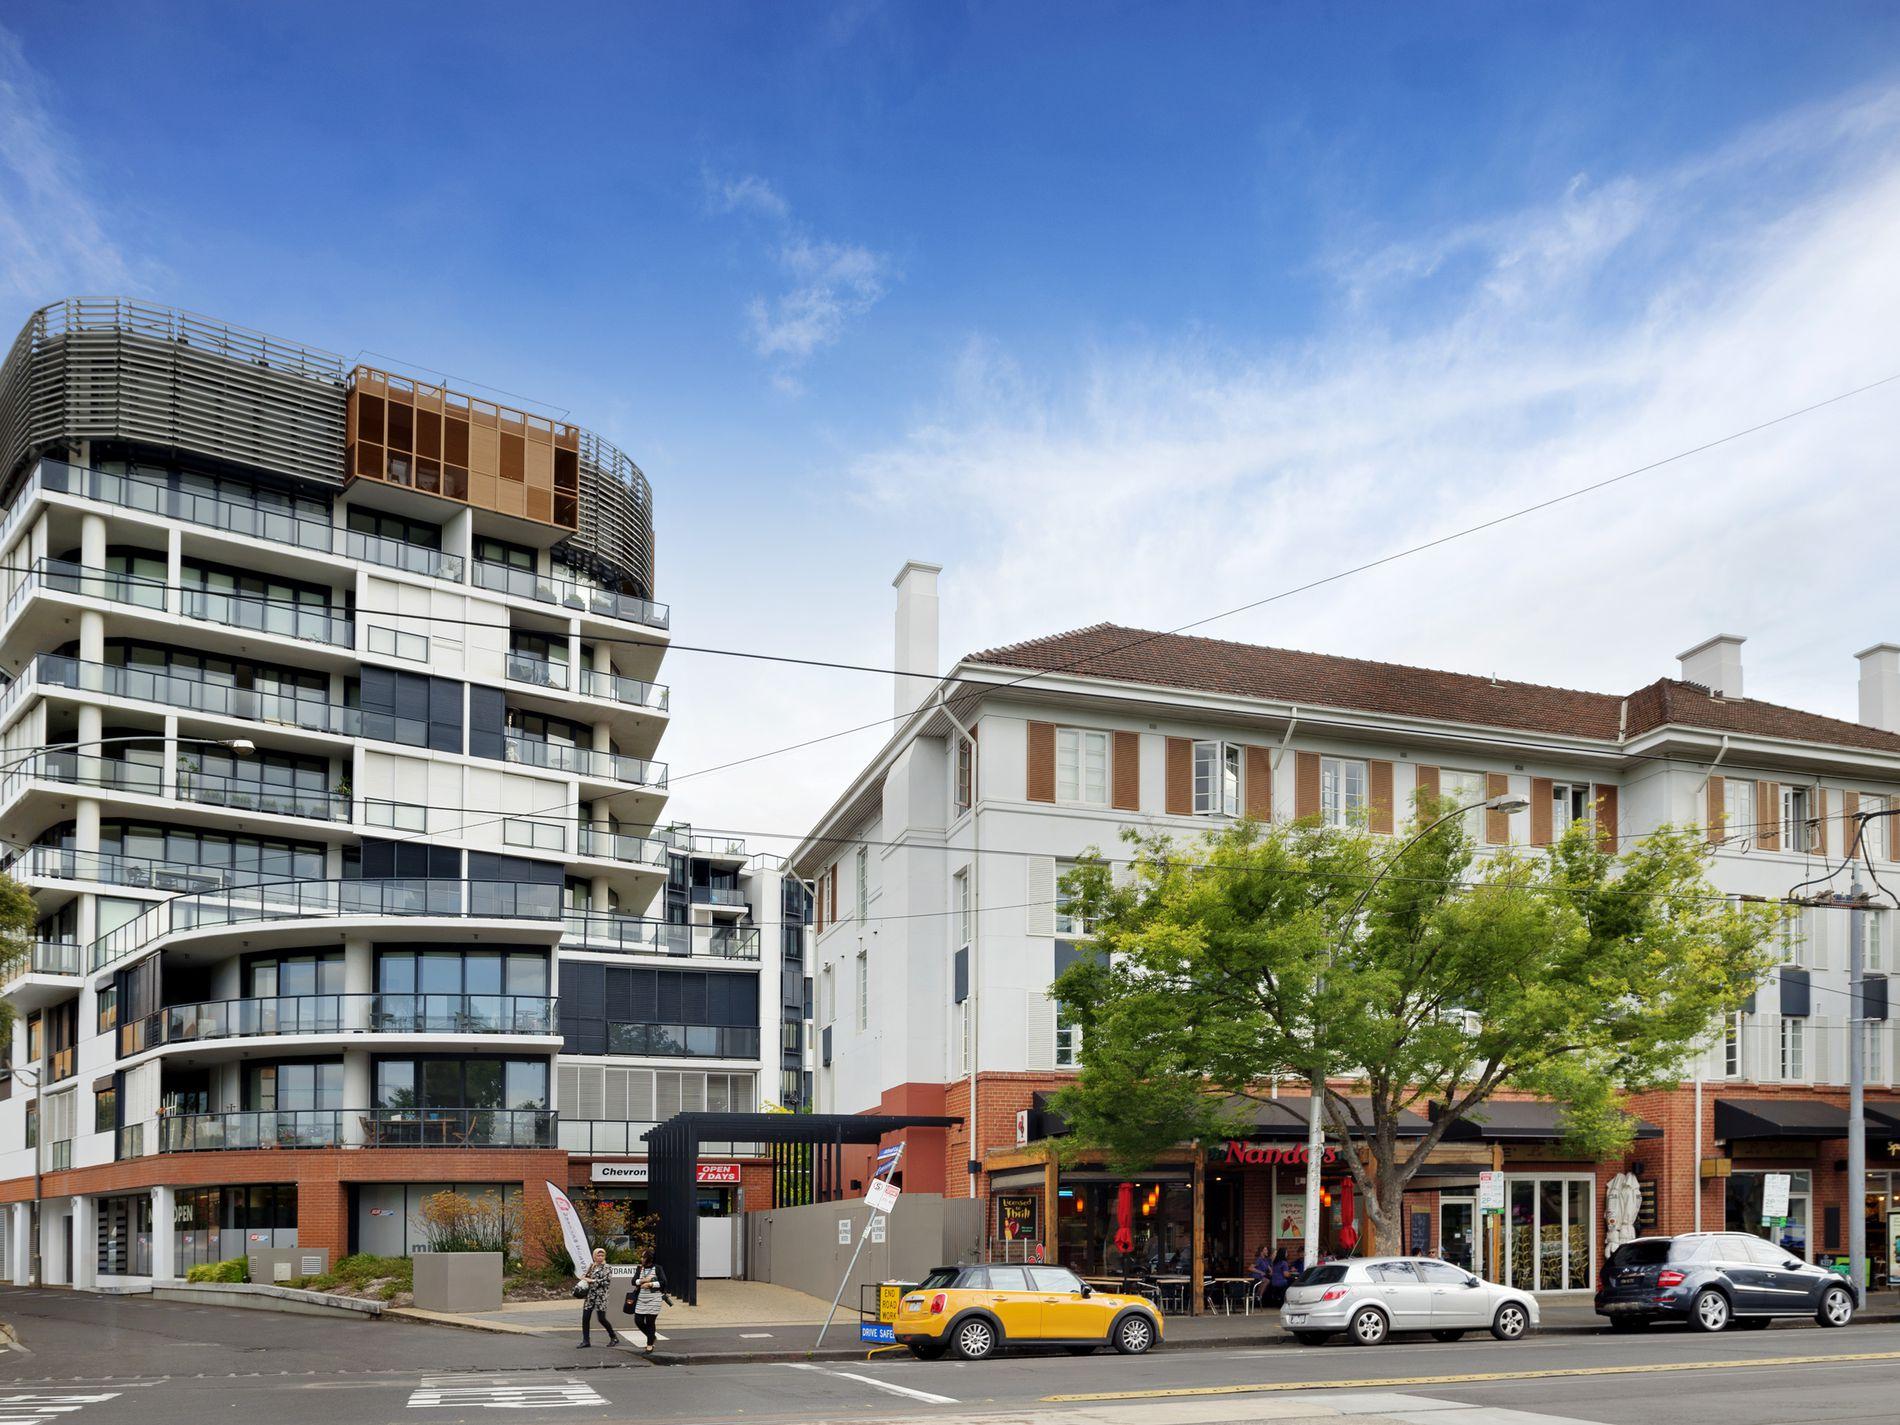 109 / 9 Commercial Road, Melbourne